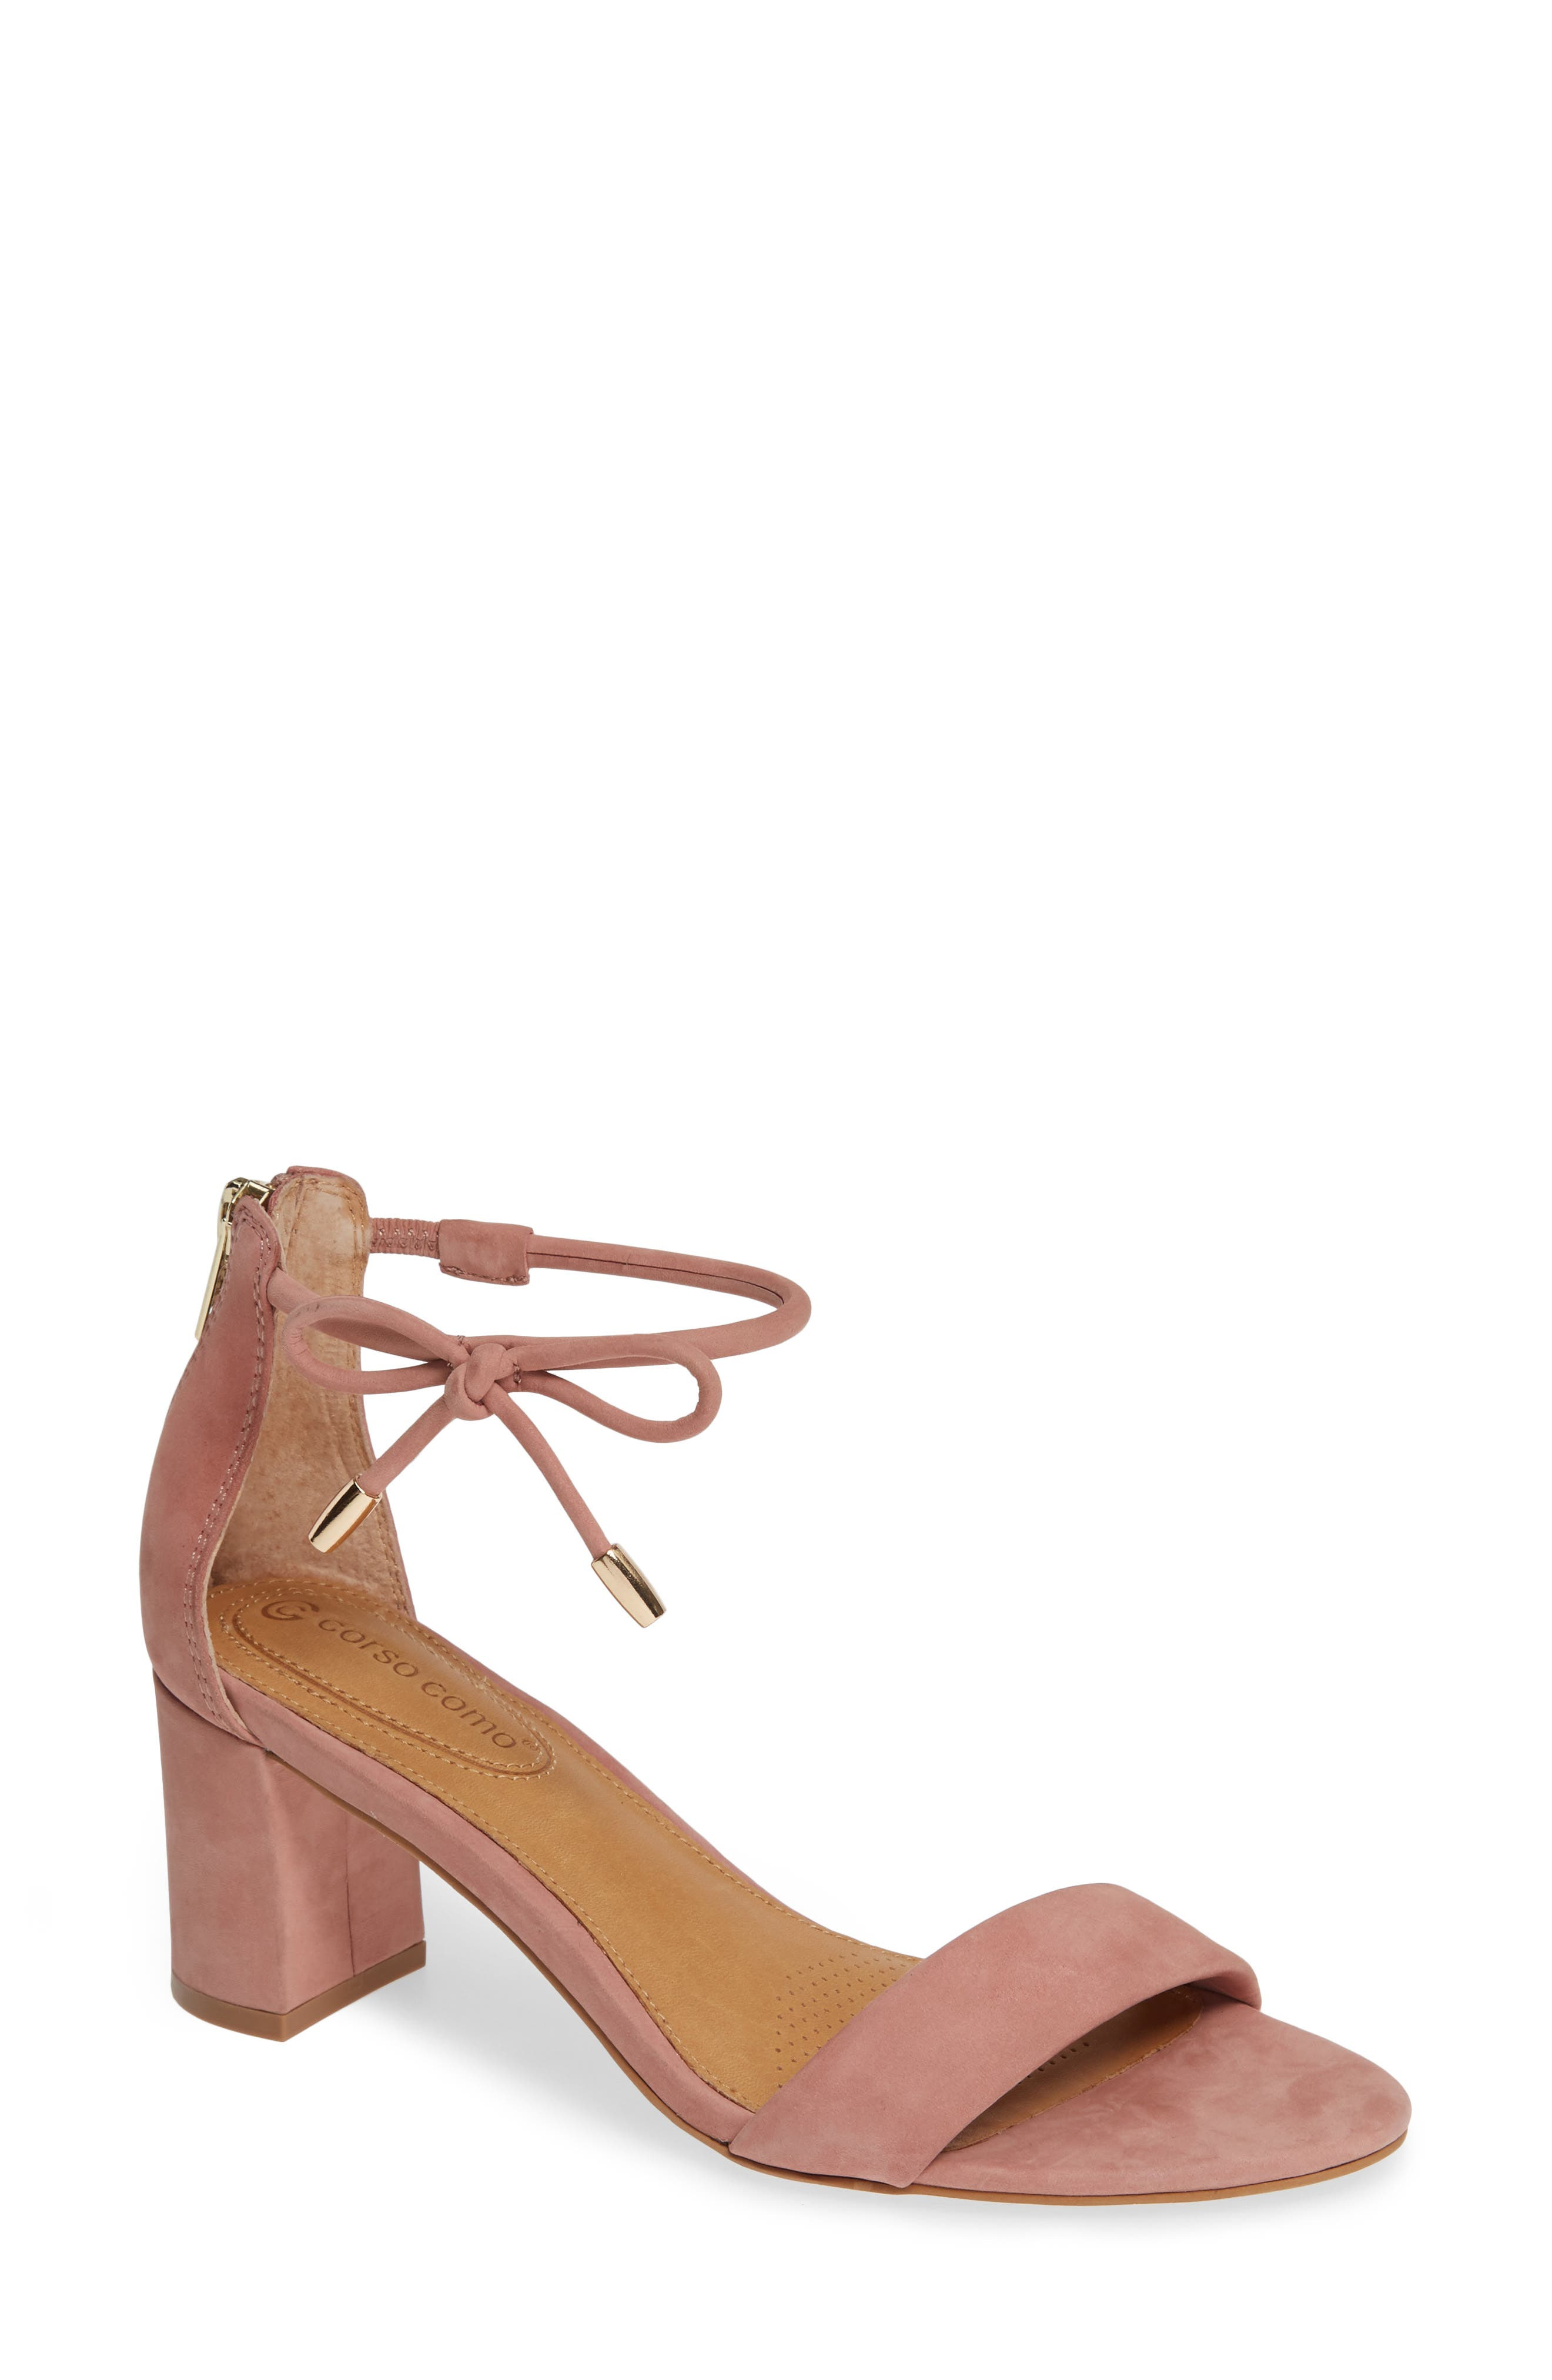 Celebratt Ankle Strap Sandal,                         Main,                         color, OLD ROSE NUBUCK LEATHER